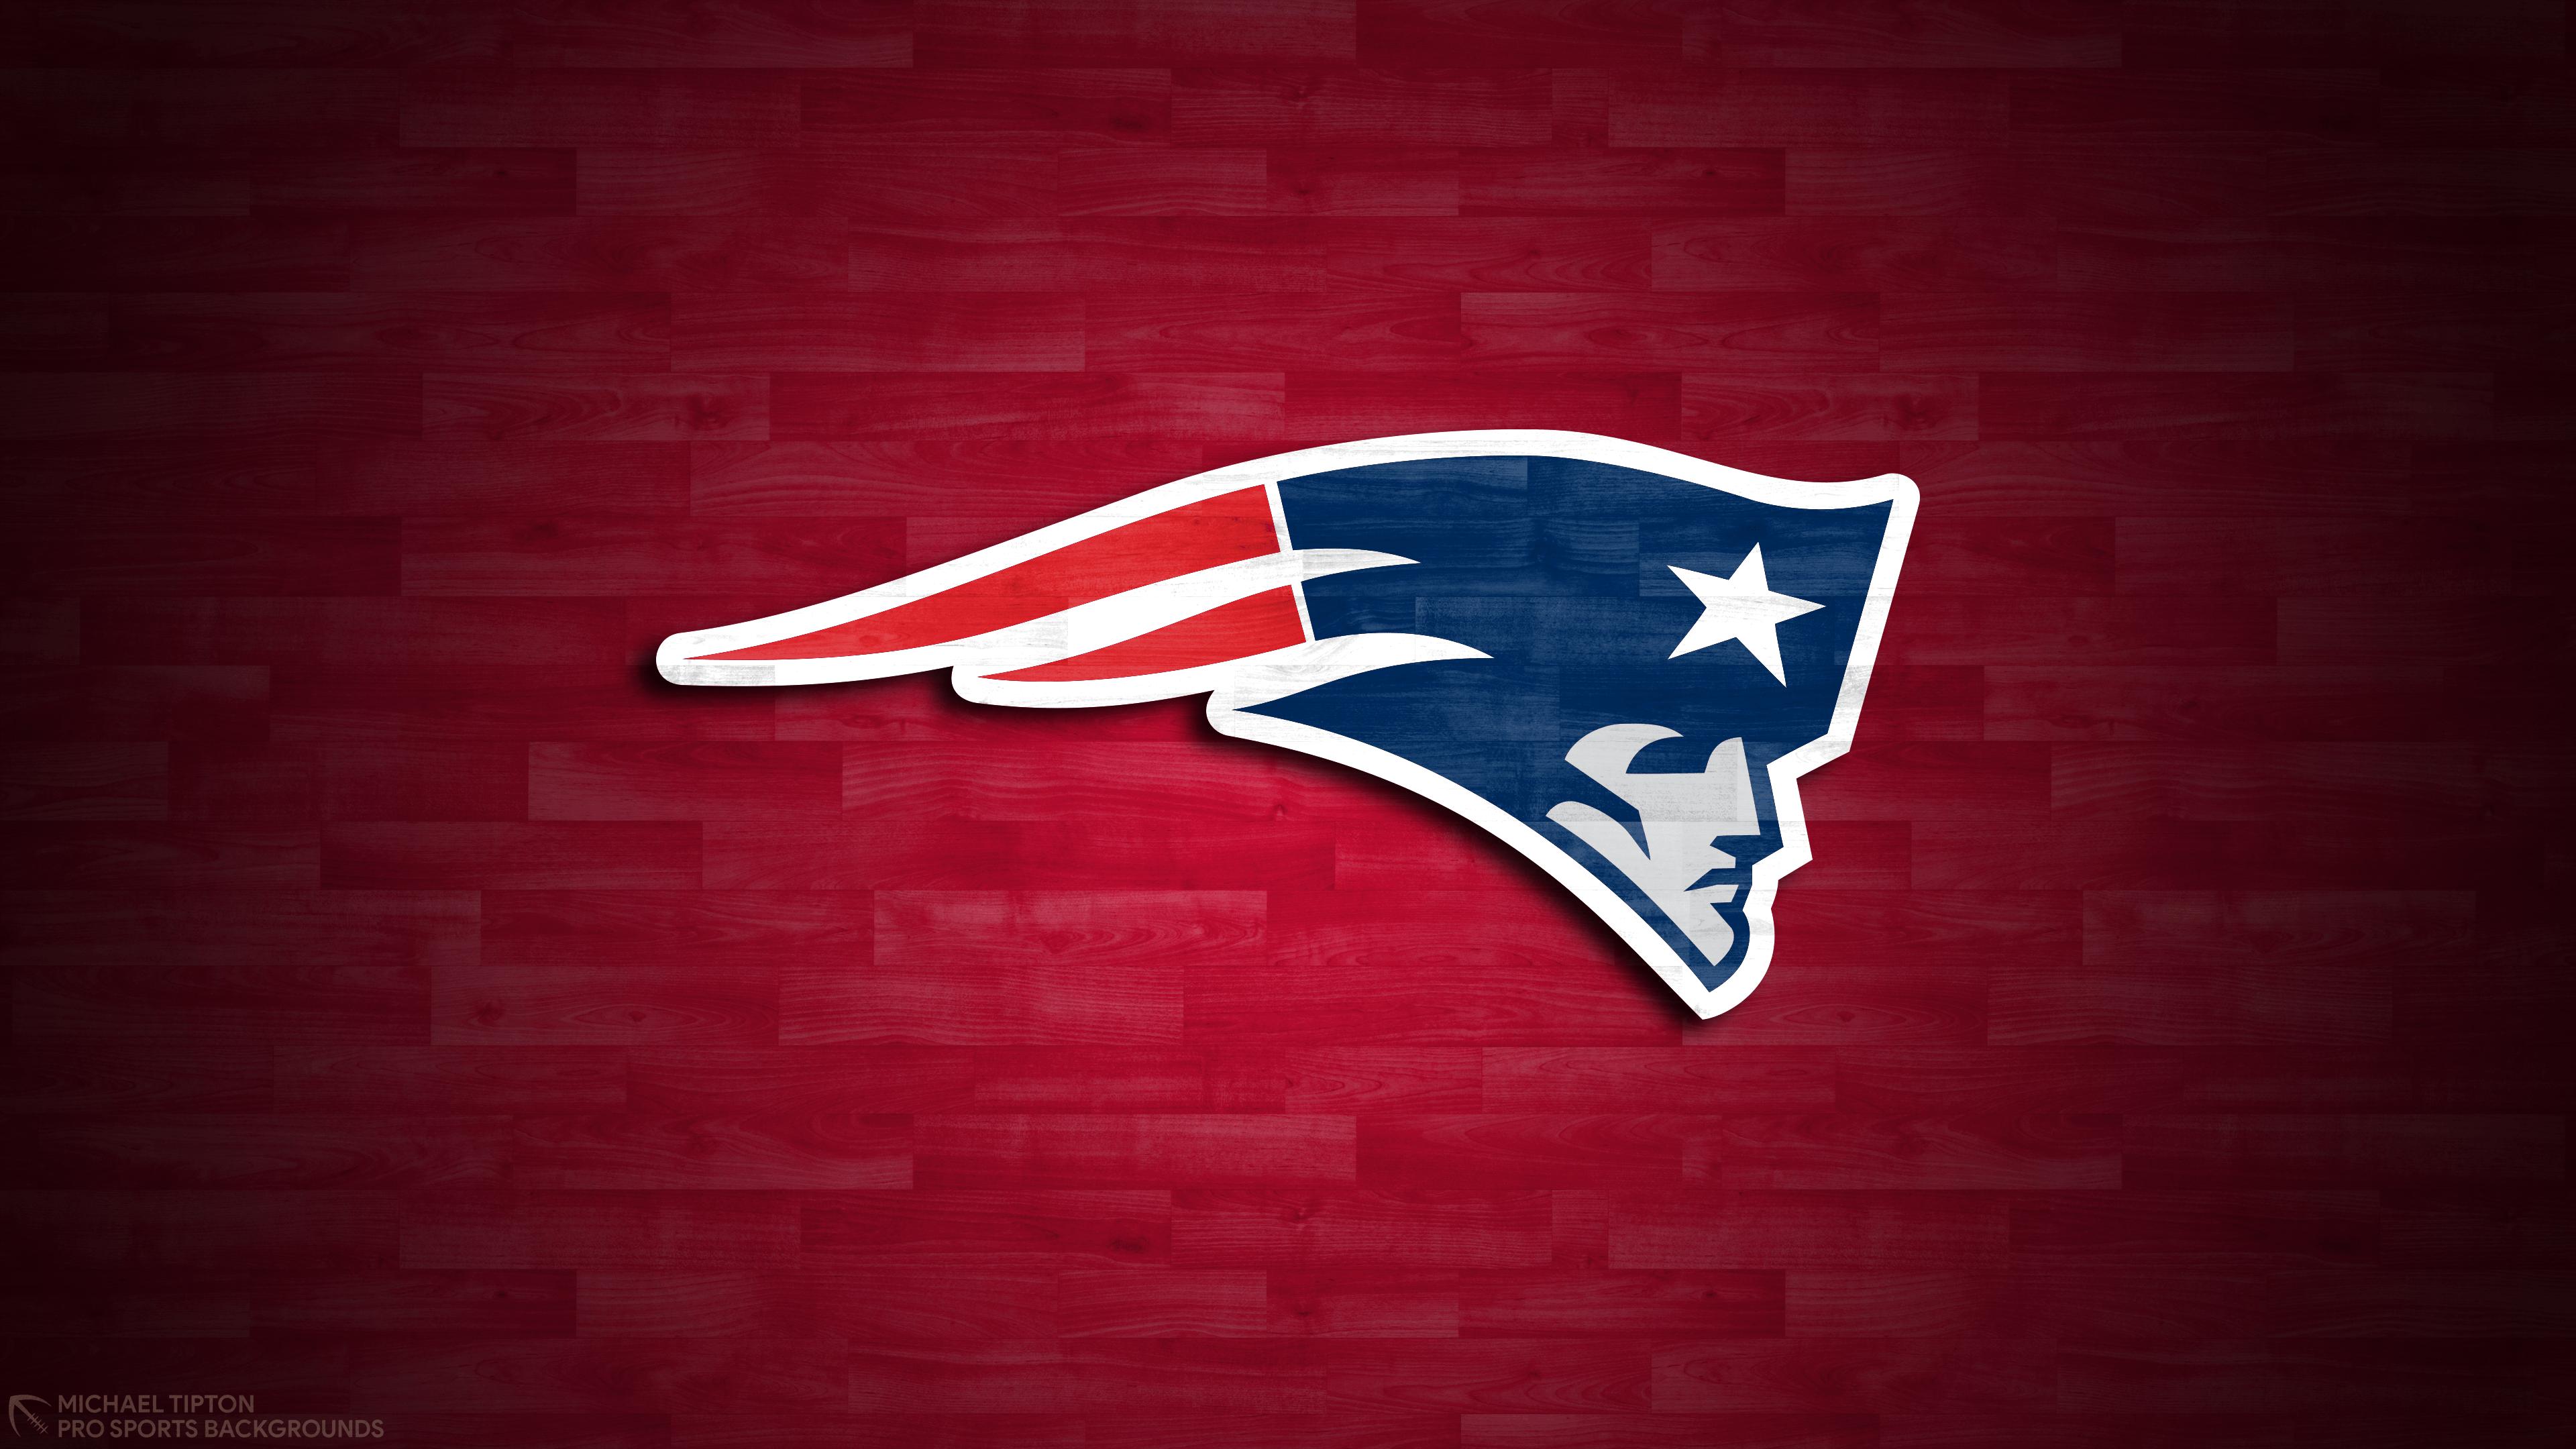 New England Patriots 2019 Wallpapers - Wallpaper Cave